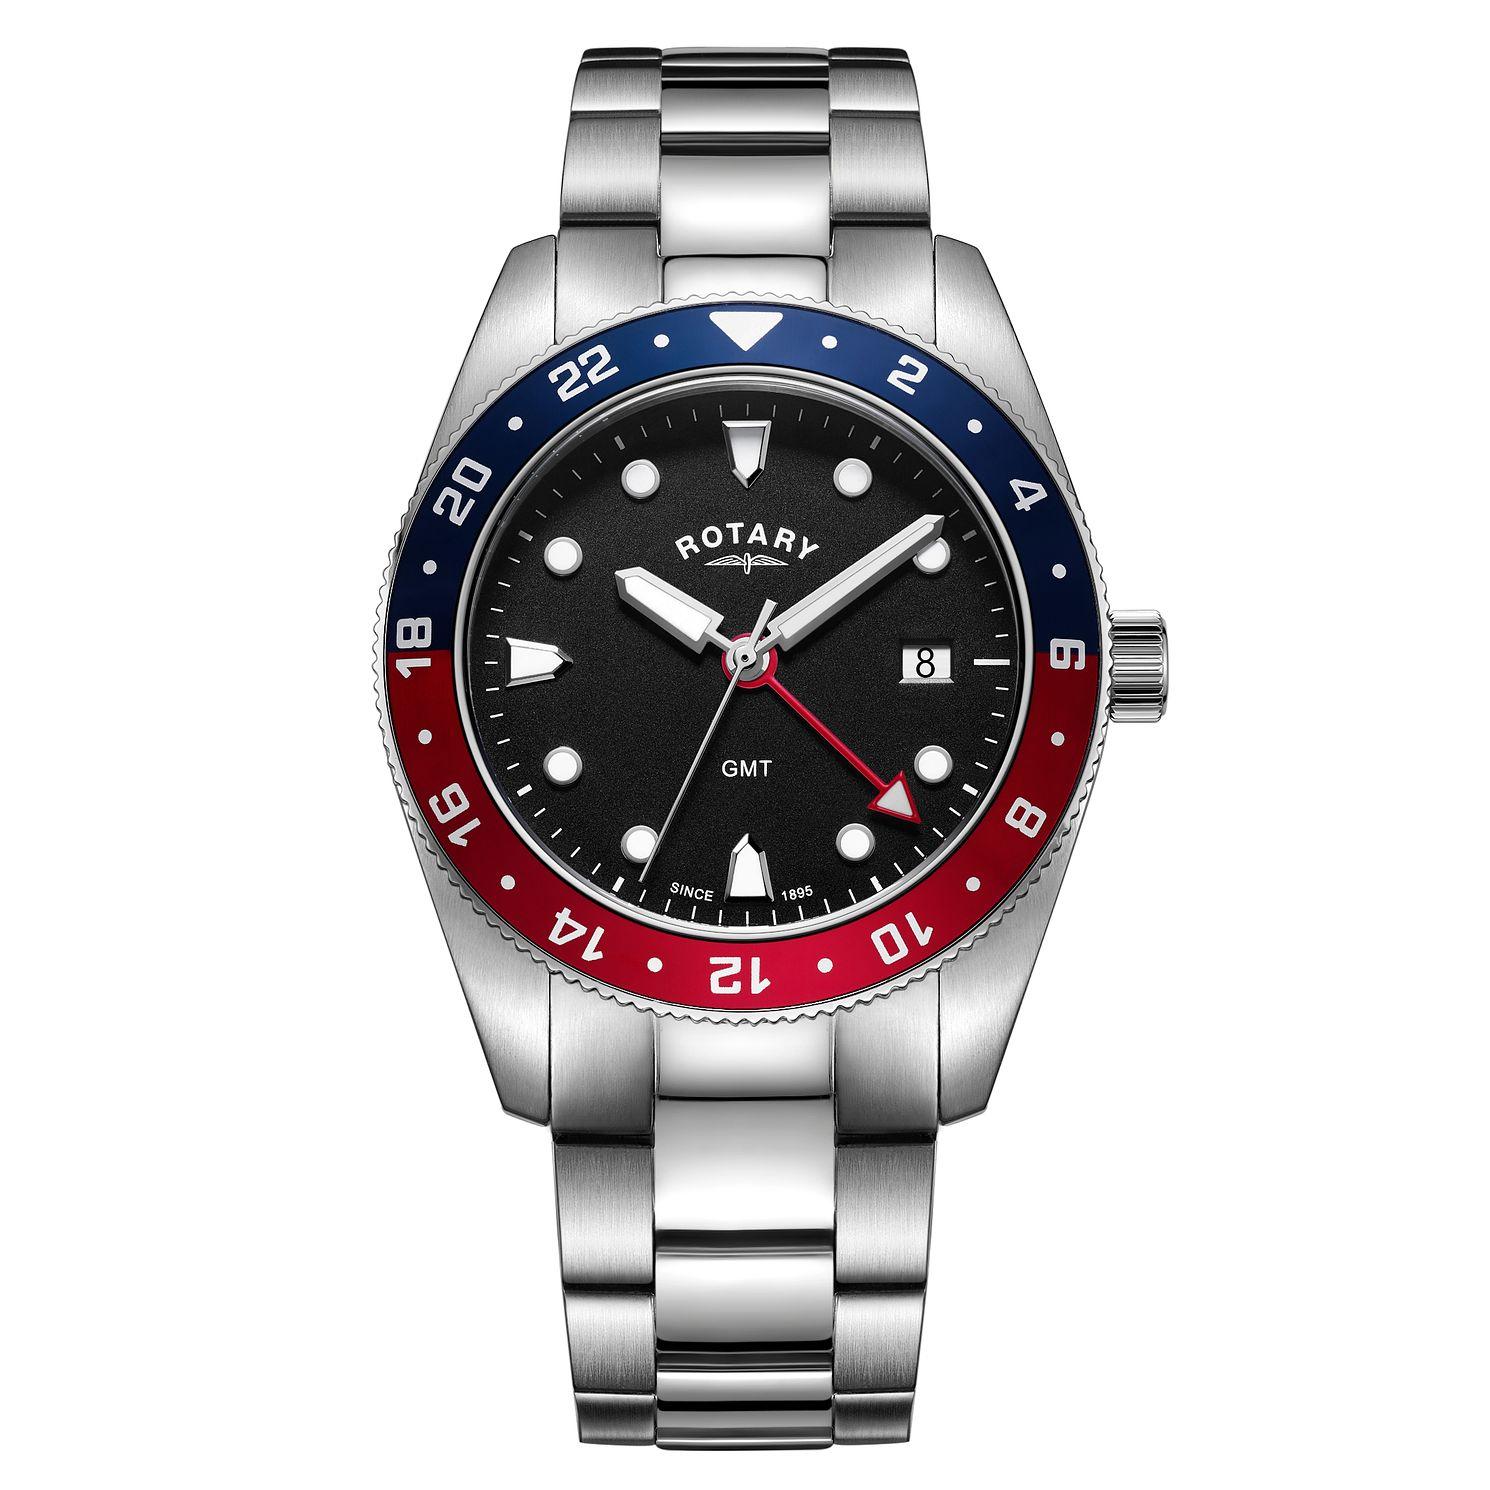 Rotary GMT Men's Stainless Steel Bracelet Watch £99 @ Ernest Jones